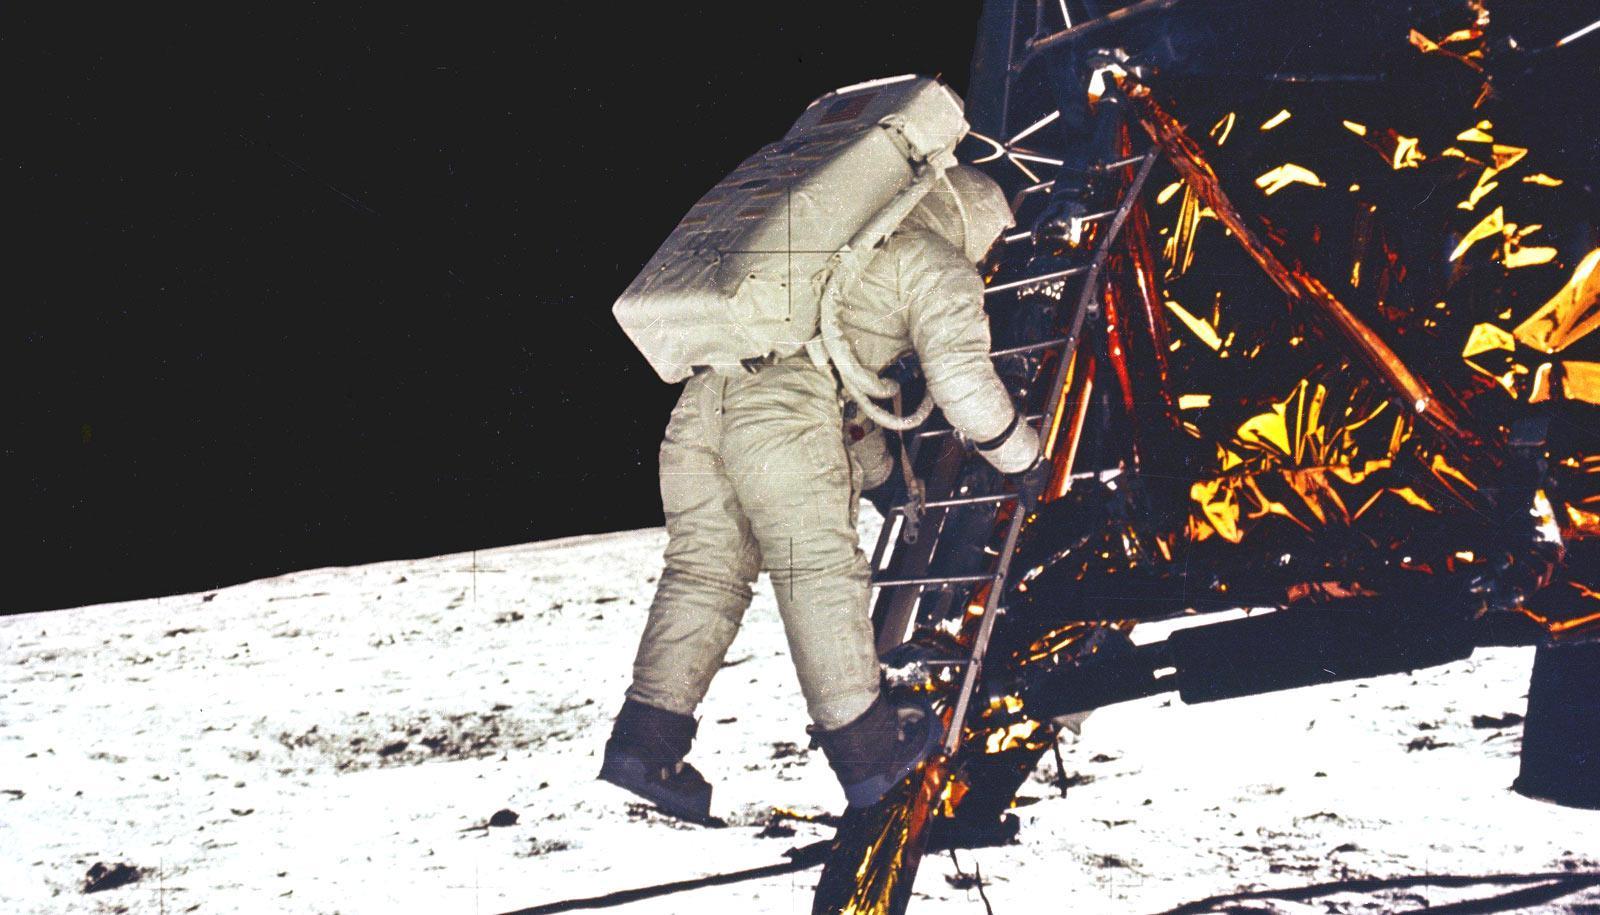 lunar samples - Buzz Aldrin steps onto moon